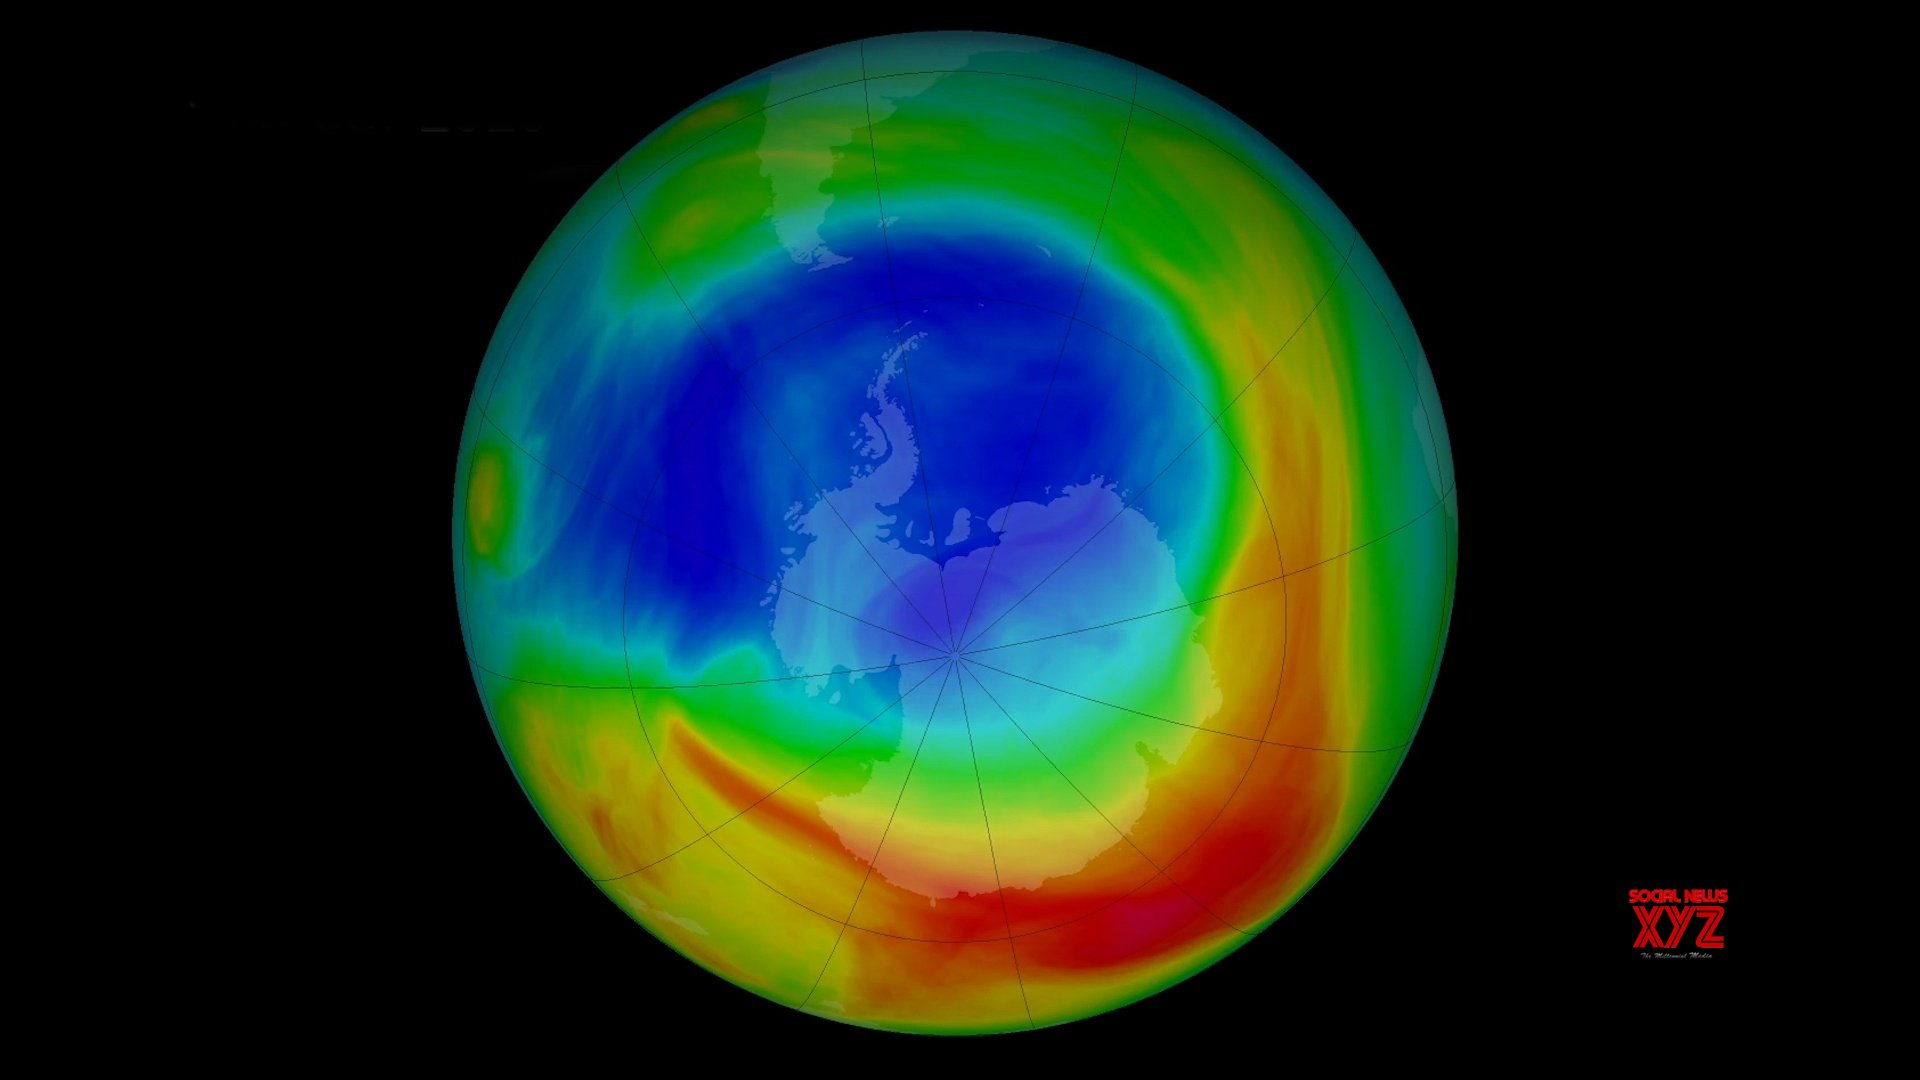 Covid lockdowns cut NOx emissions, global ozone by 15%: NASA